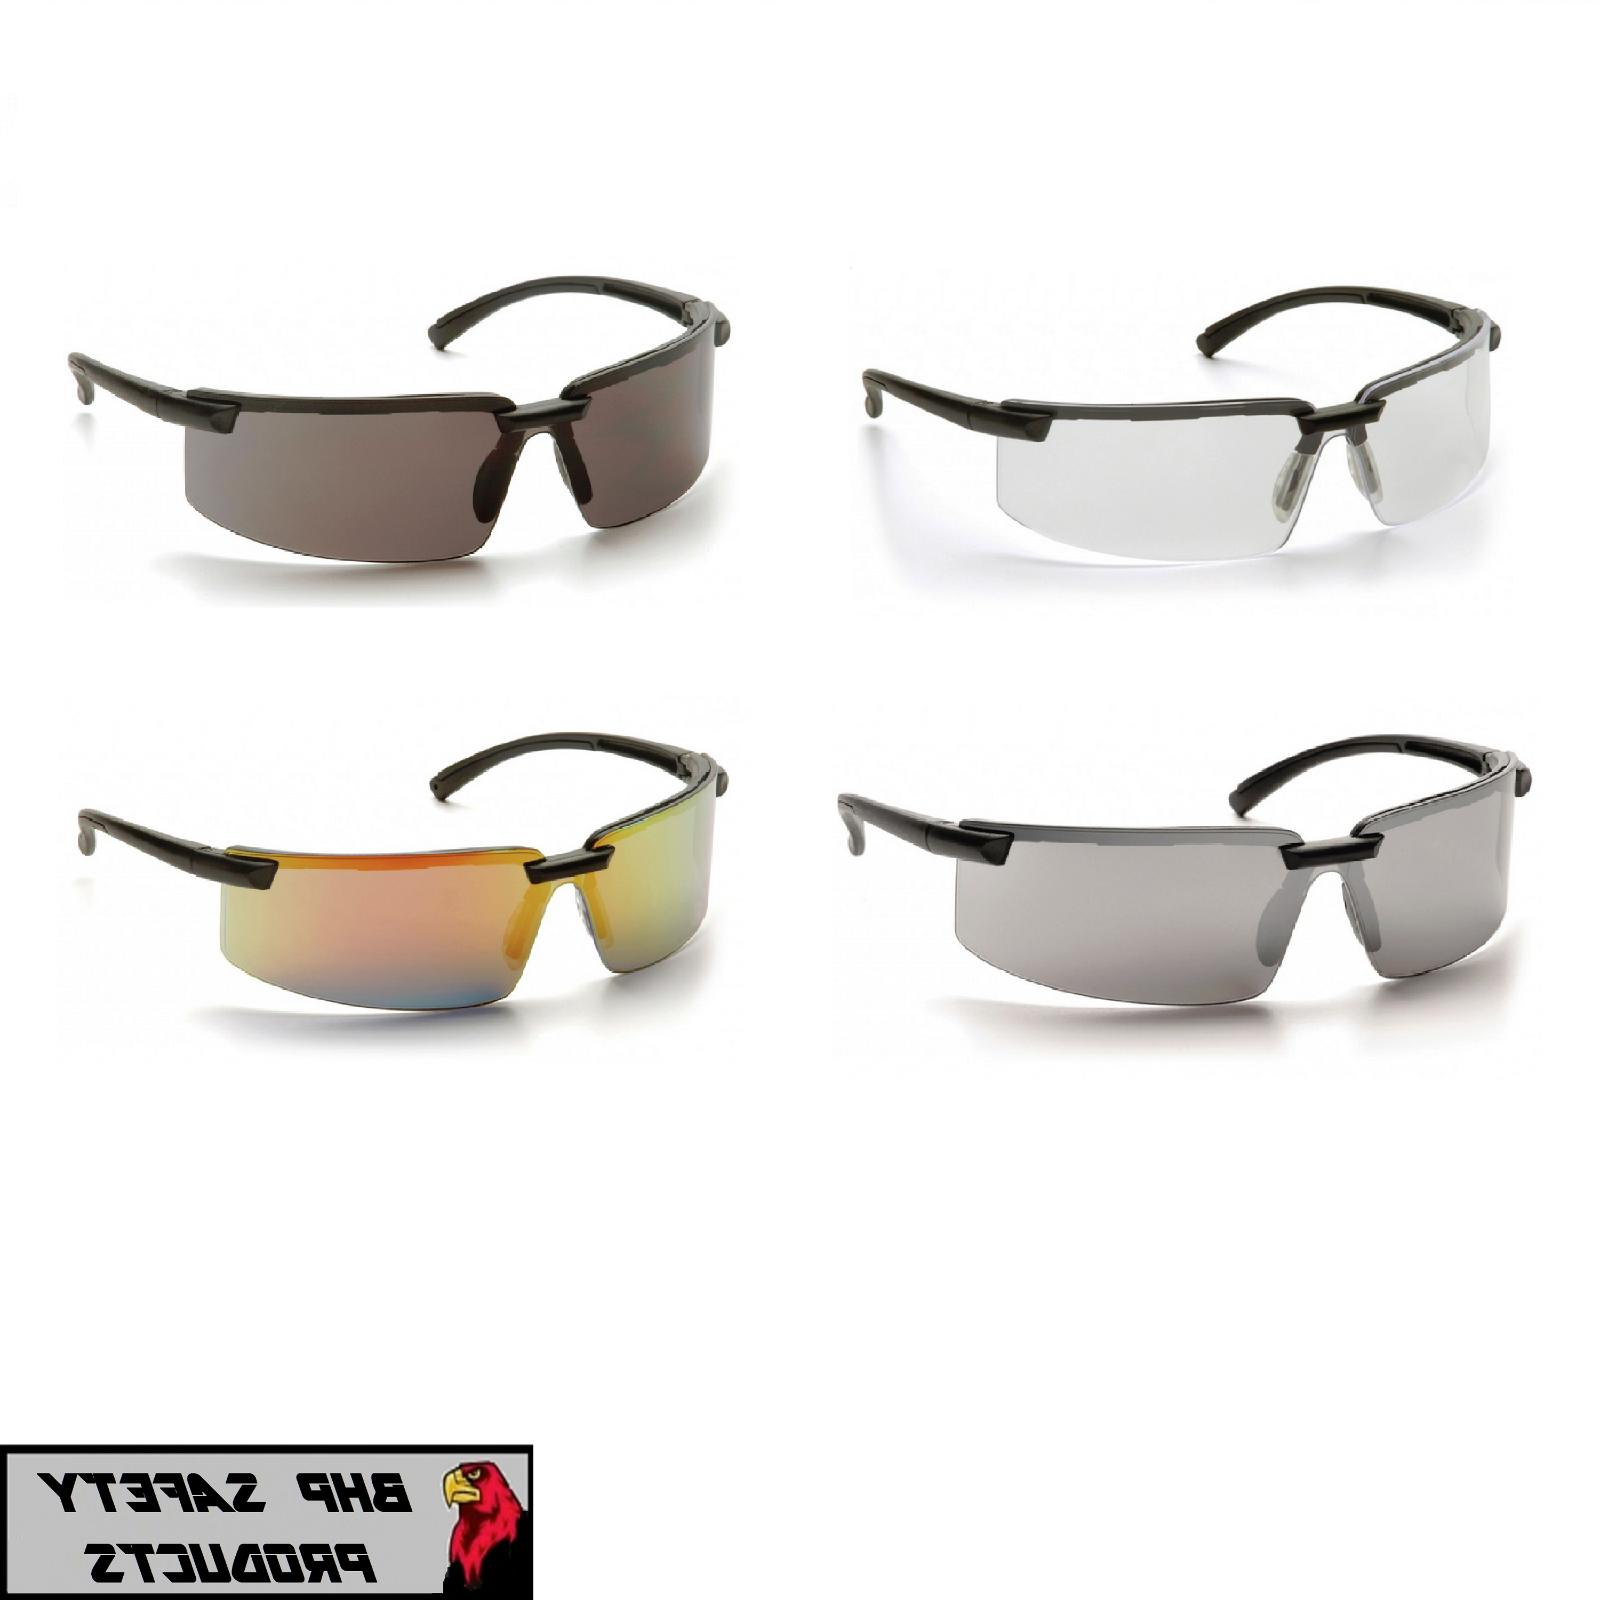 surveyor safety glasses black frame work eyewear